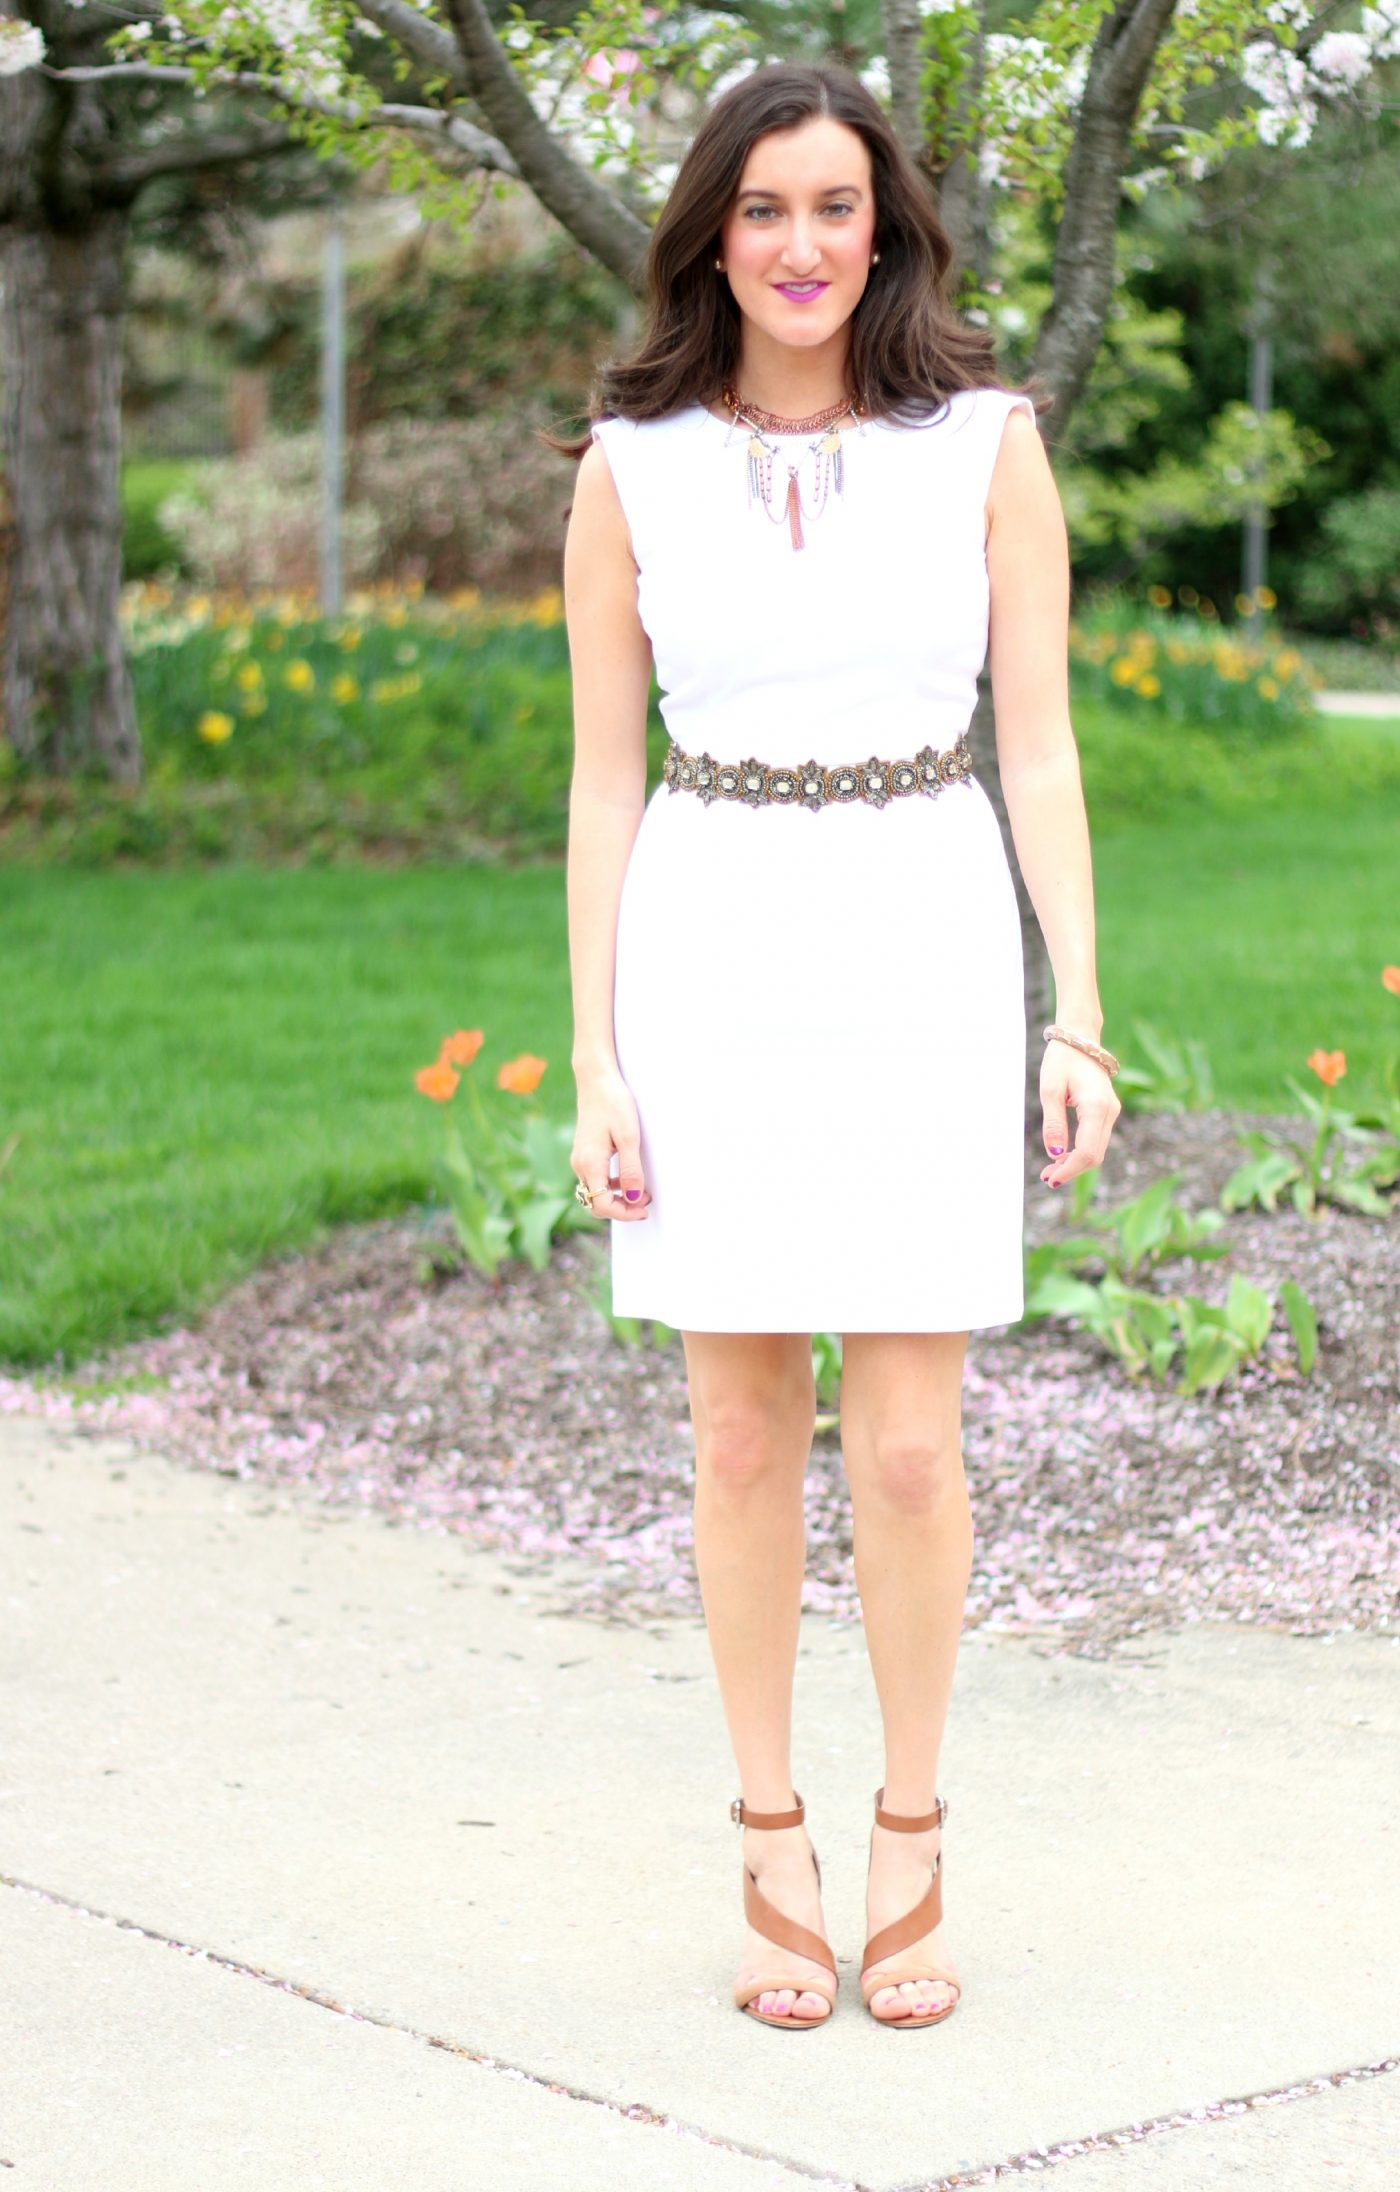 Accessorizing a White Dress